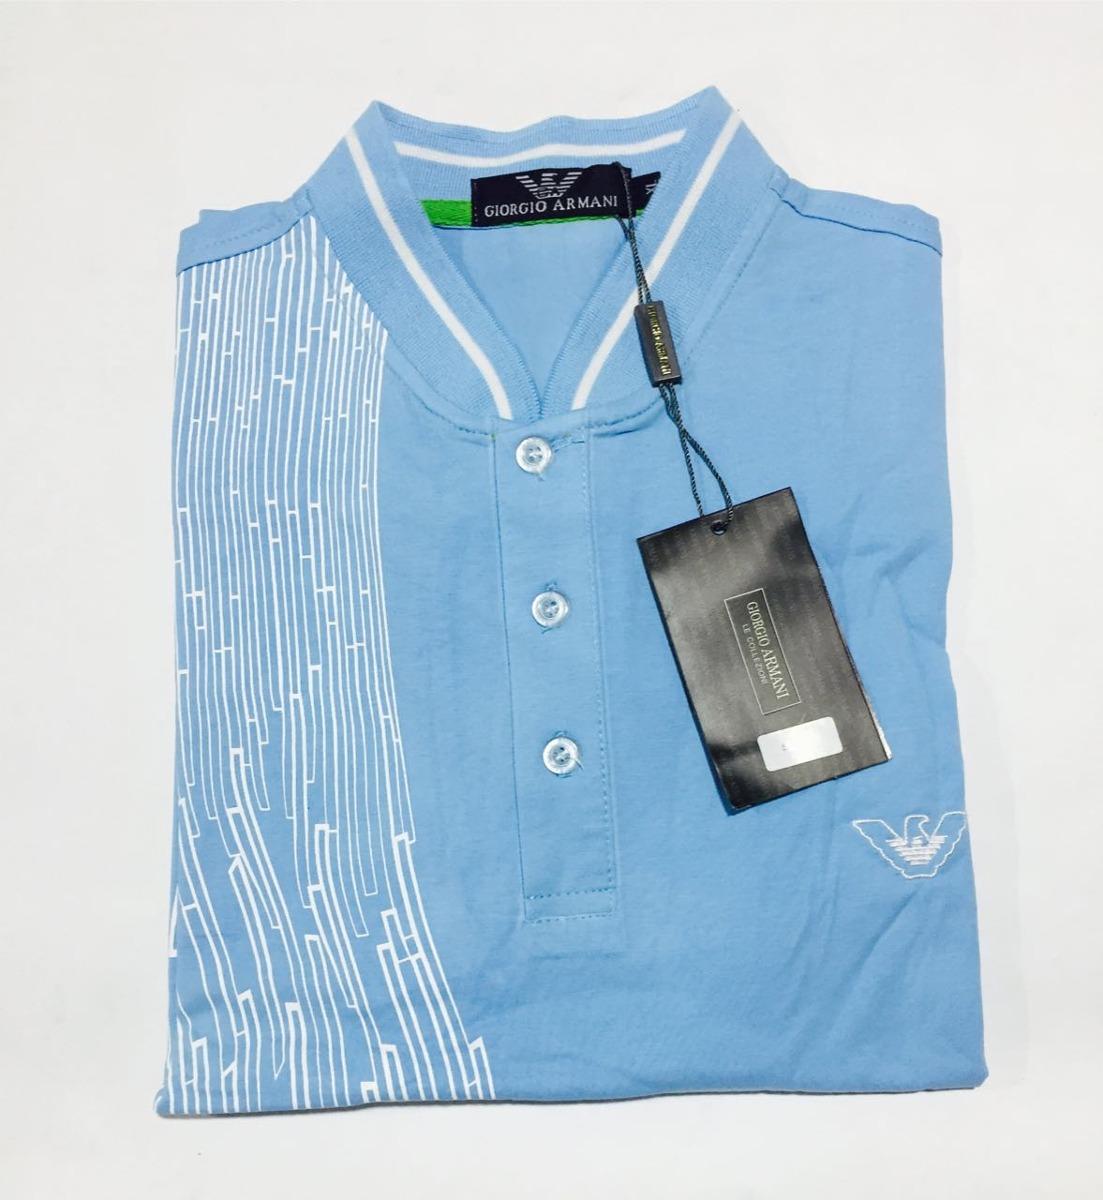 70033d018 Camisas Polo De Todas Las Marcas Original ¿ -   70.000 en Mercado Libre